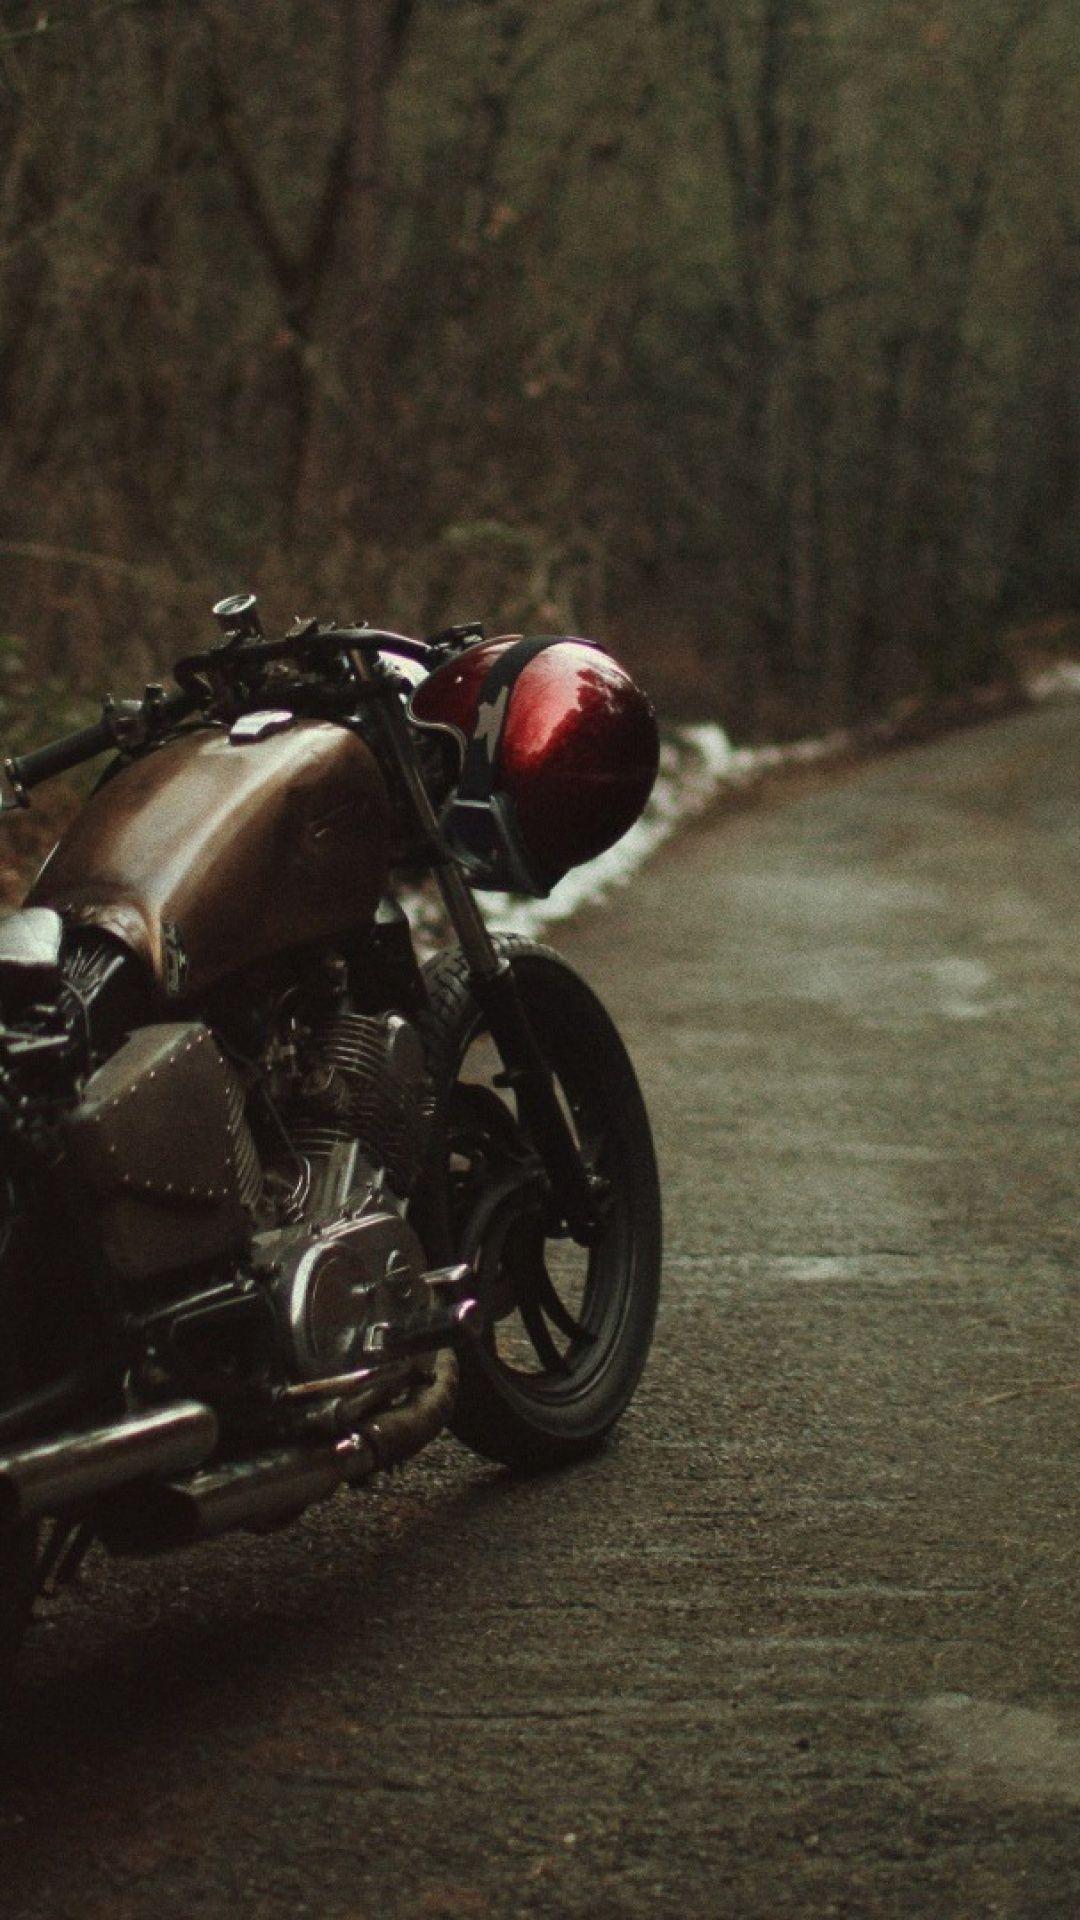 Harley Davidson iPhone 6 Wallpaper | ID: 56069